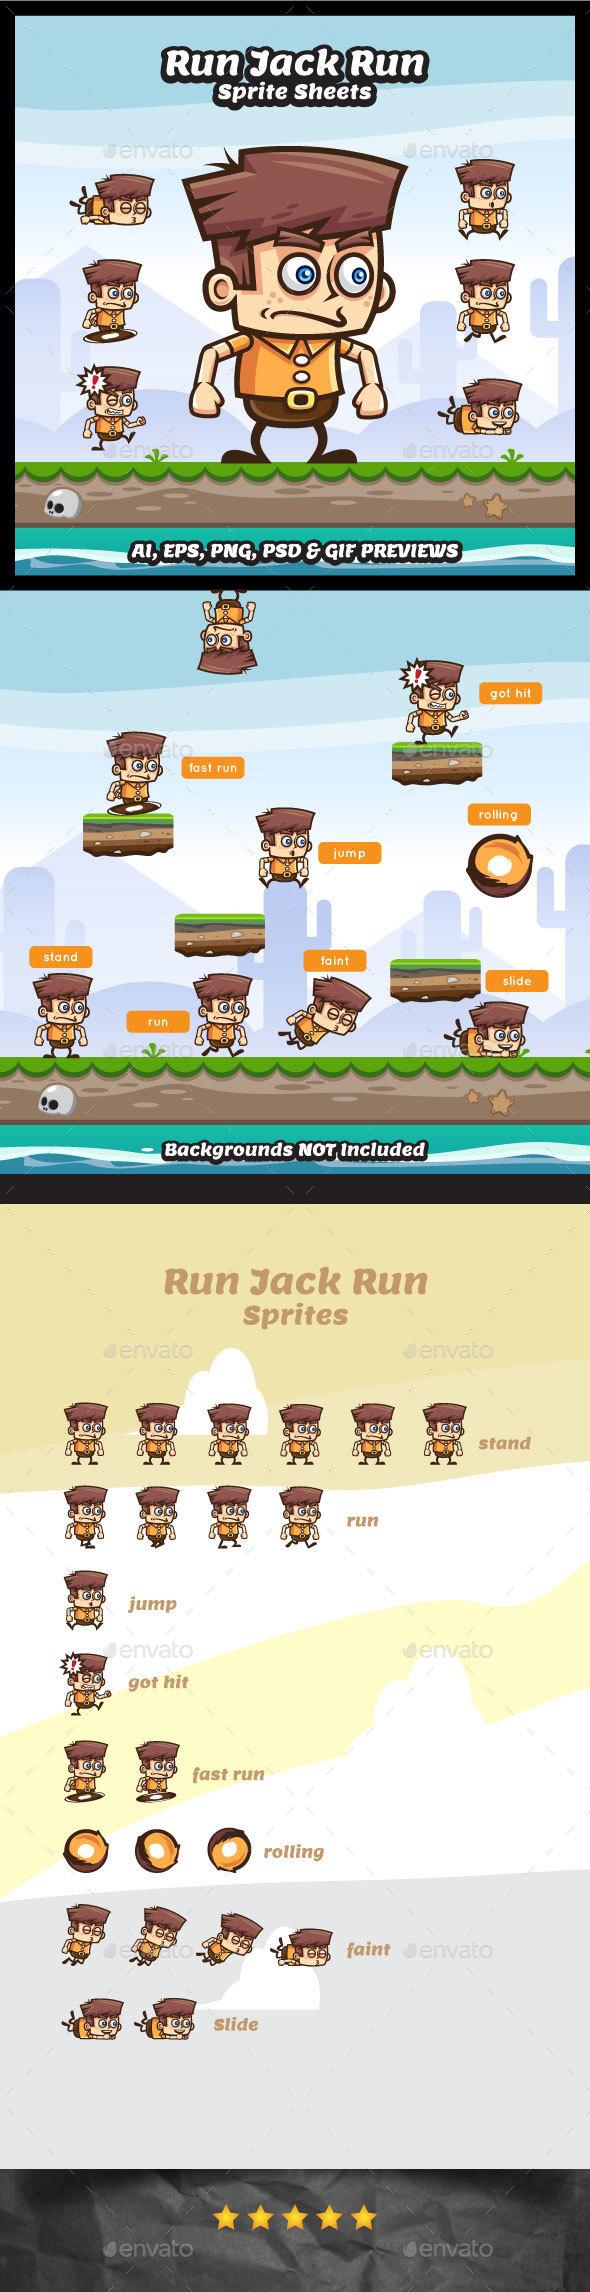 Run Jack Run Sprite Sheets - Sprites Game Assets